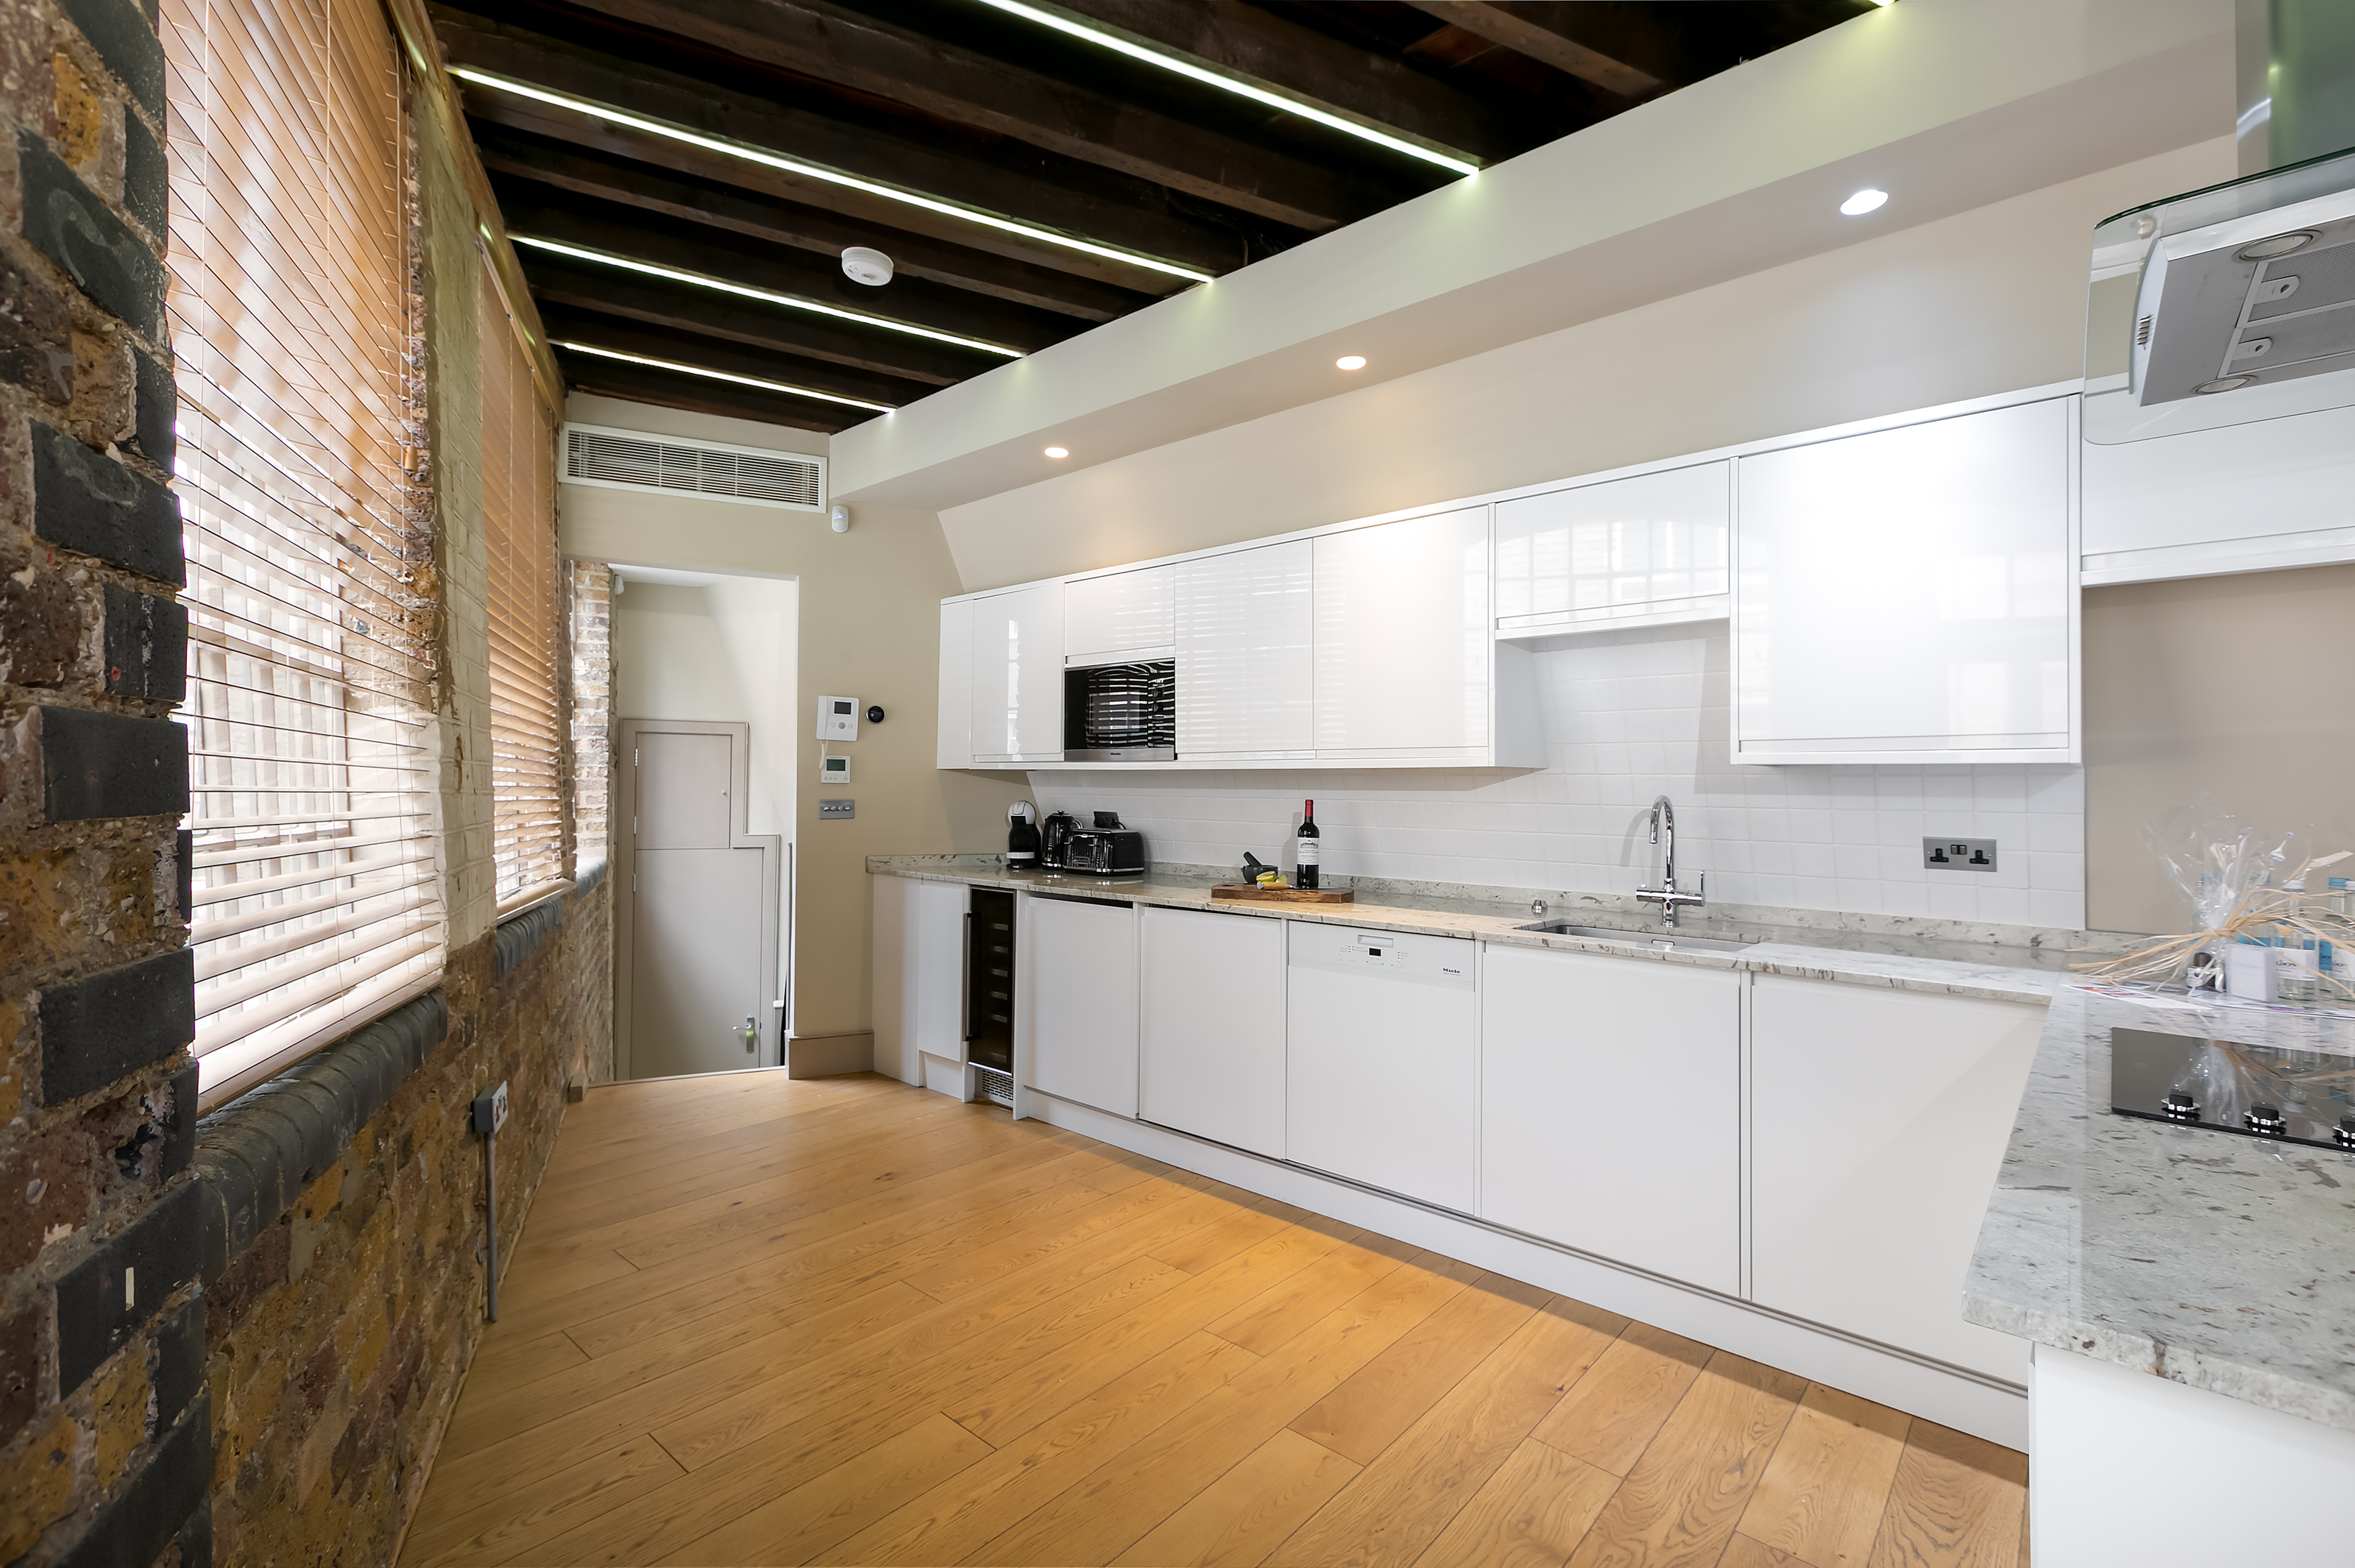 Lovelydays luxury service apartment rental - London - Fitzrovia - Wells Mews A - Lovelysuite - 2 bedrooms - 2 bathrooms - Luxury kitchen - 5 star serviced apartments in london - acdc163a05bf - Lovelydays